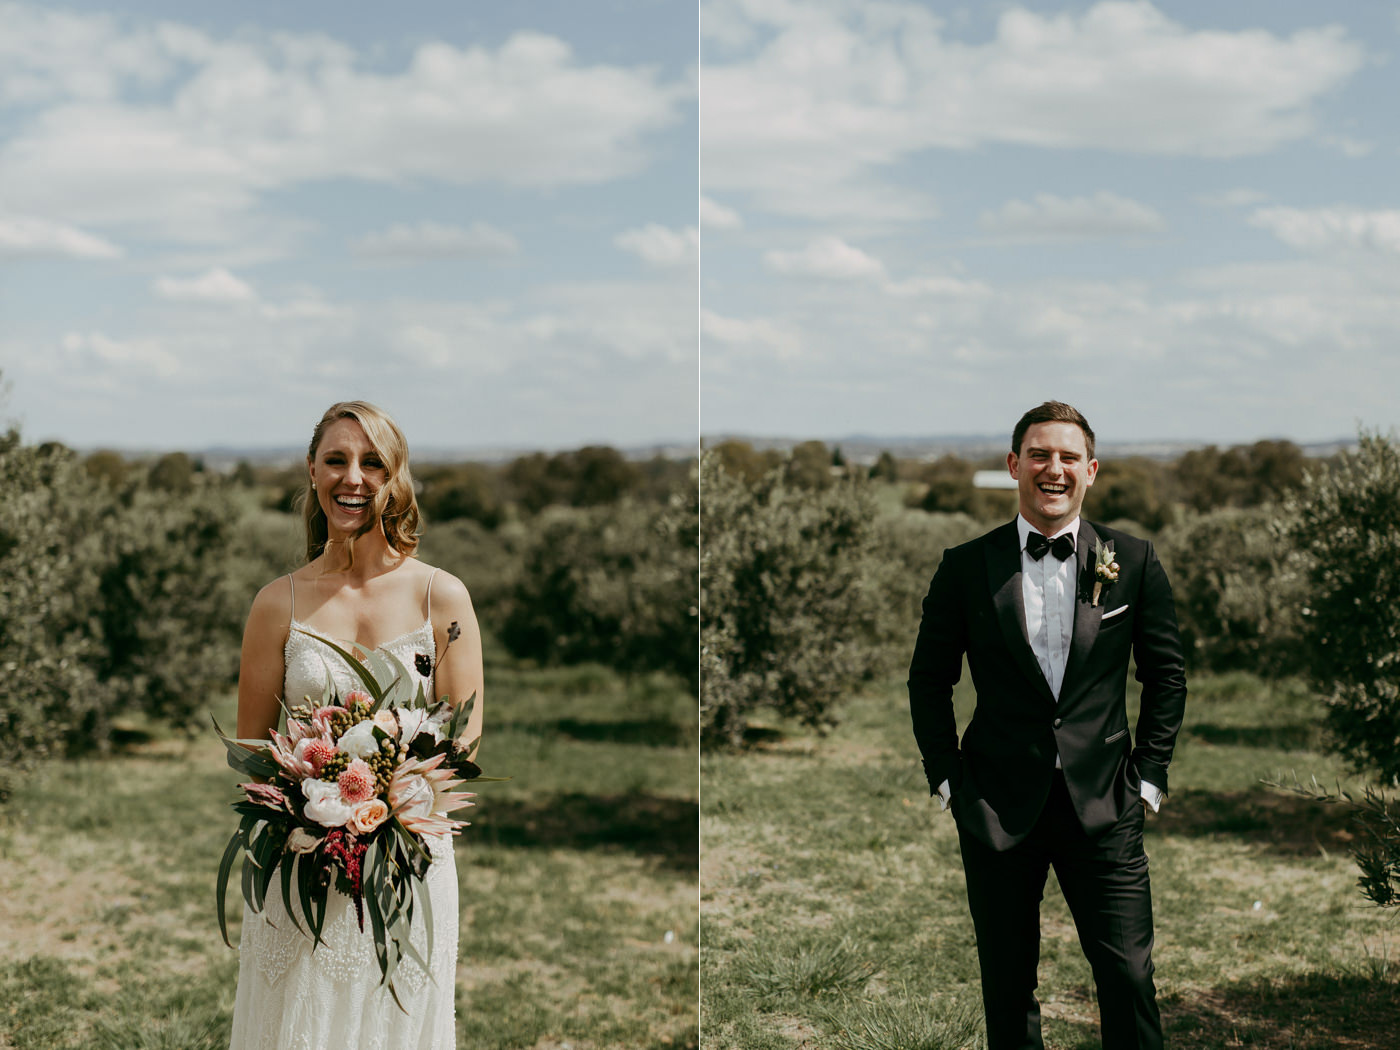 Anthony & Eliet - Wagga Wagga Wedding - Country NSW - Samantha Heather Photography-75.jpg